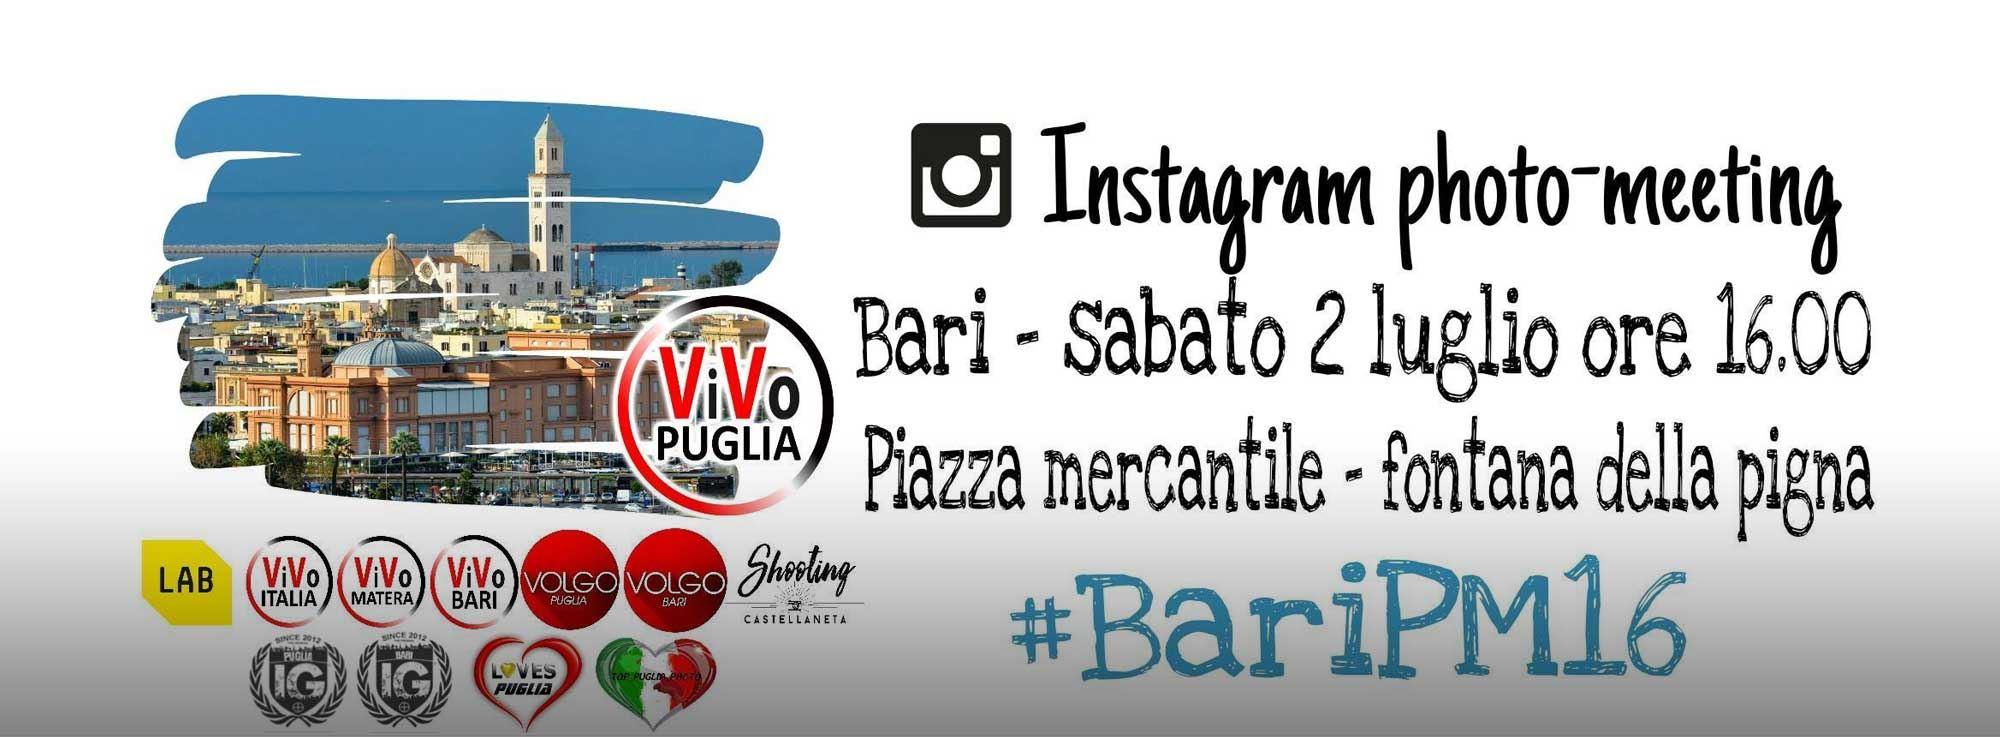 Bari: Bari Photo Meeting